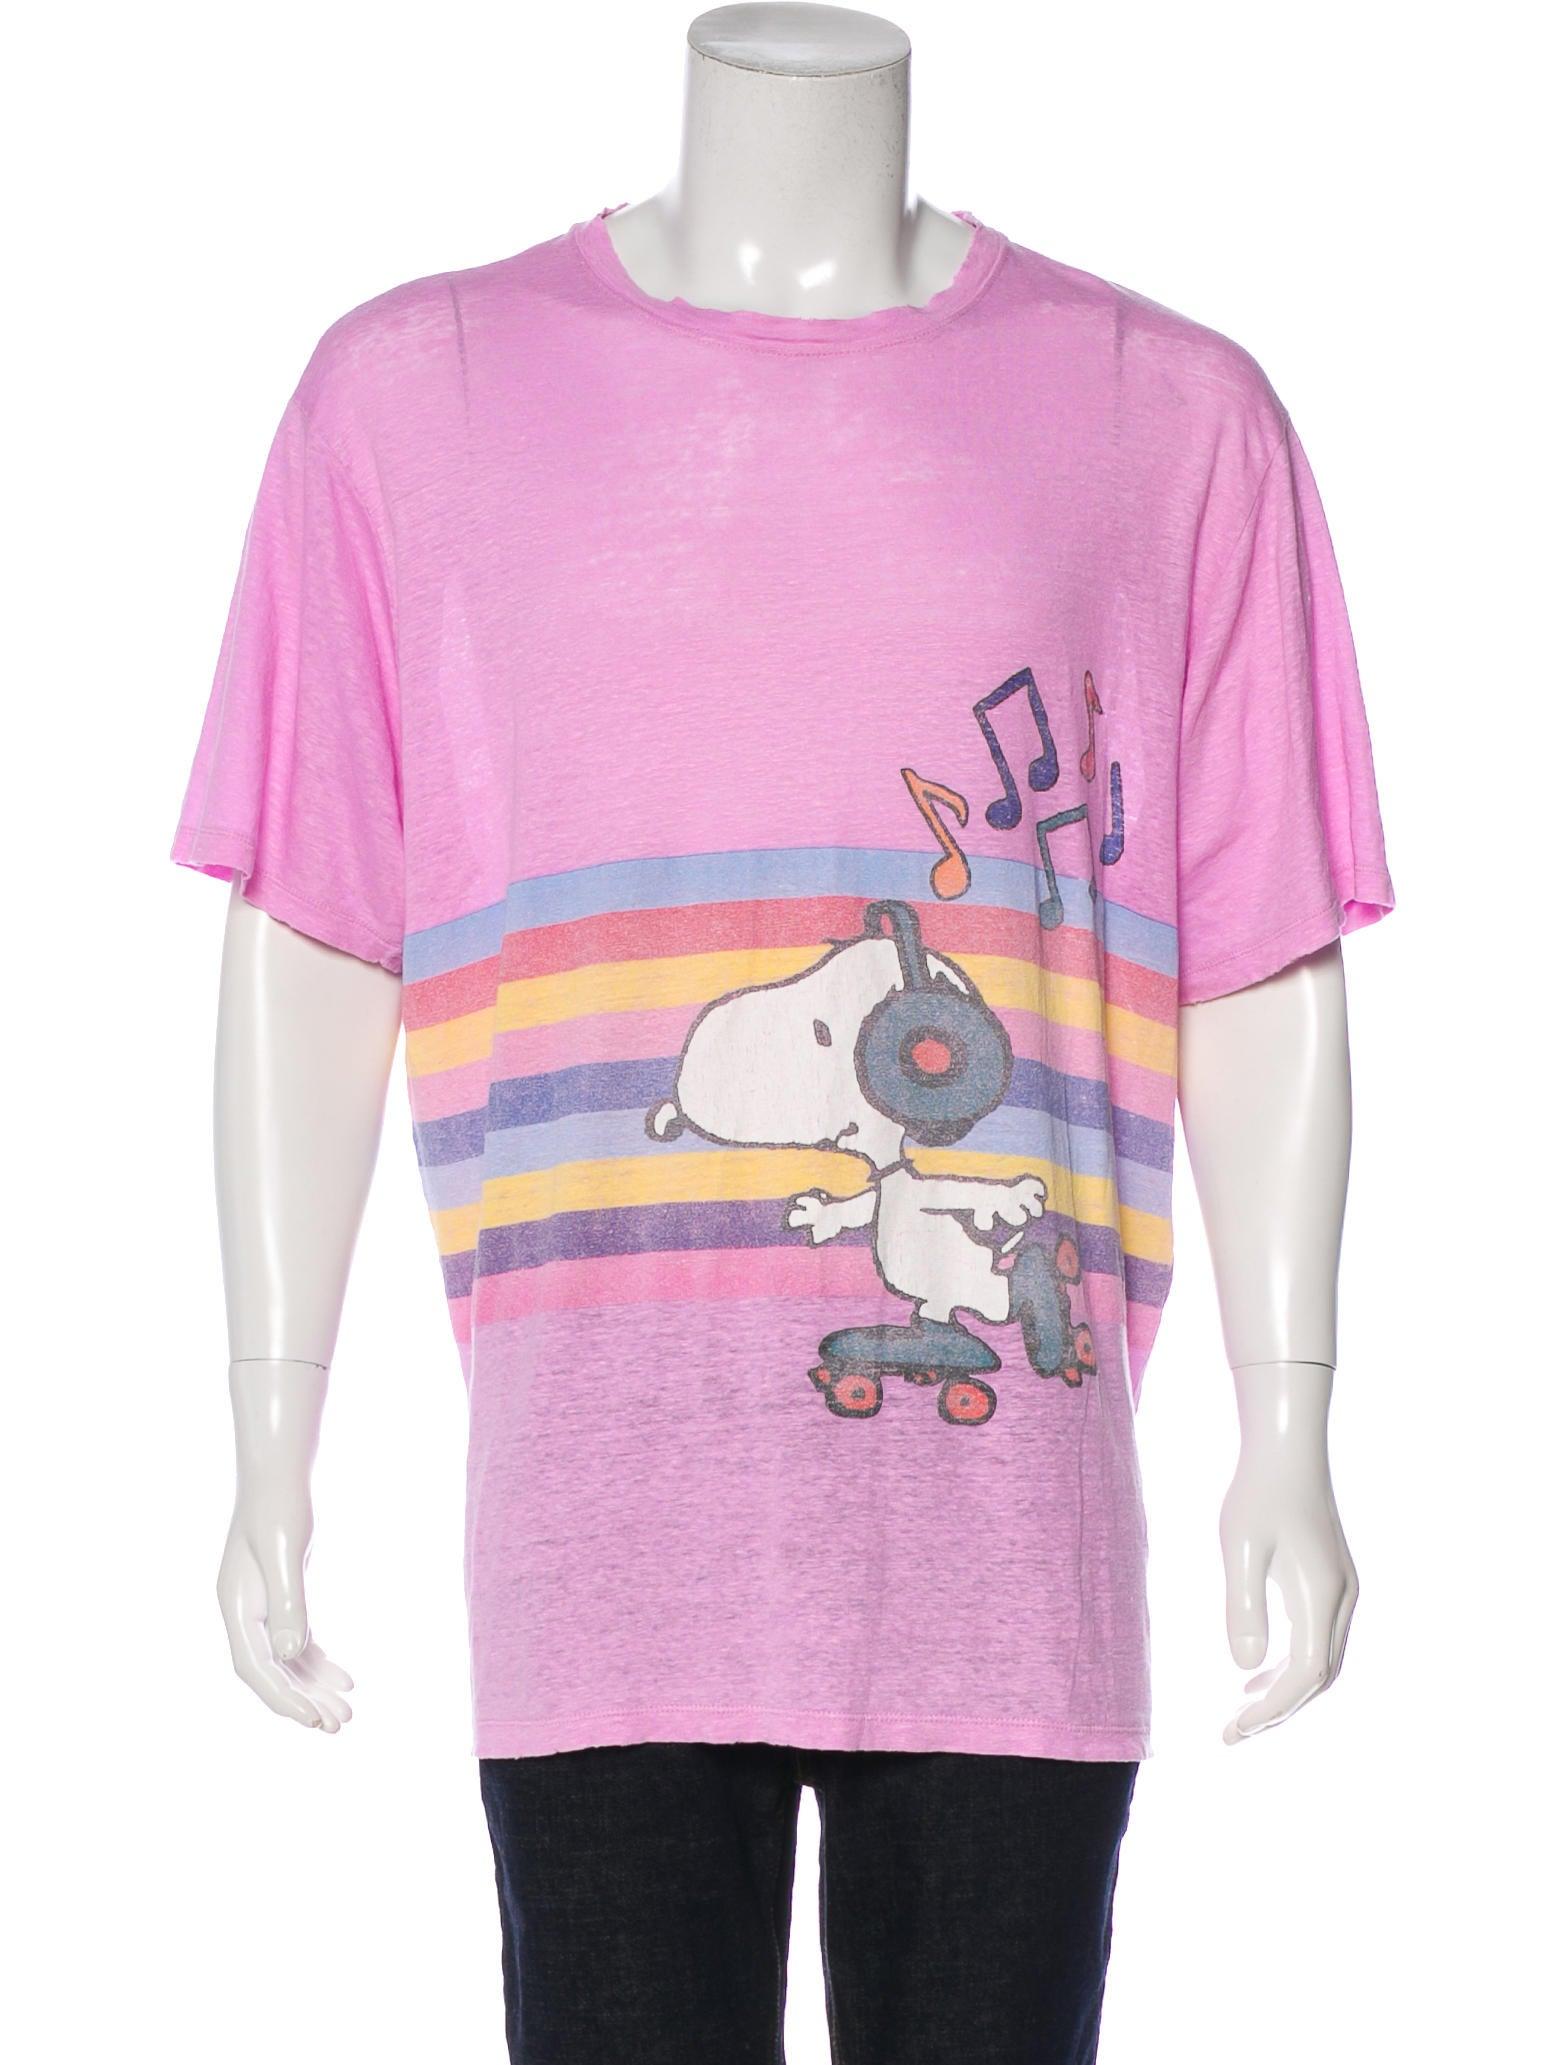 f3b6c6fd Gucci 2016 Snoopy & Woodstock T-Shirt - Clothing - GUC228744   The ...